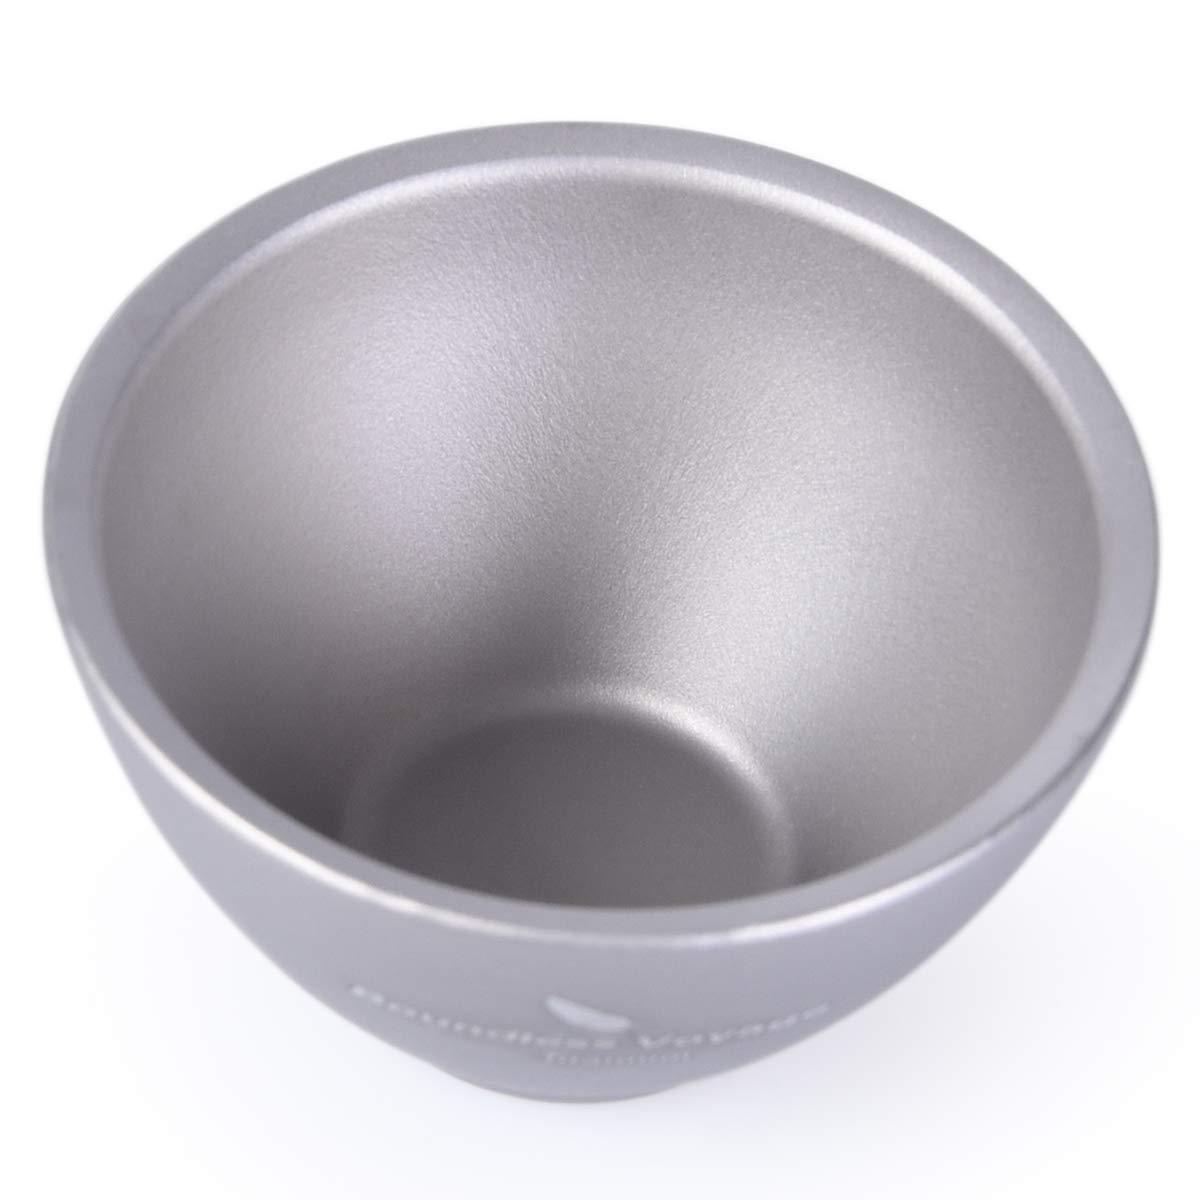 iBasingo Titanium Wine Tea Sake Cup Mug Outdoor Camping Hiking Picnic Whiskey Flask Flagon Drink(3 pieces) by iBasingo (Image #3)